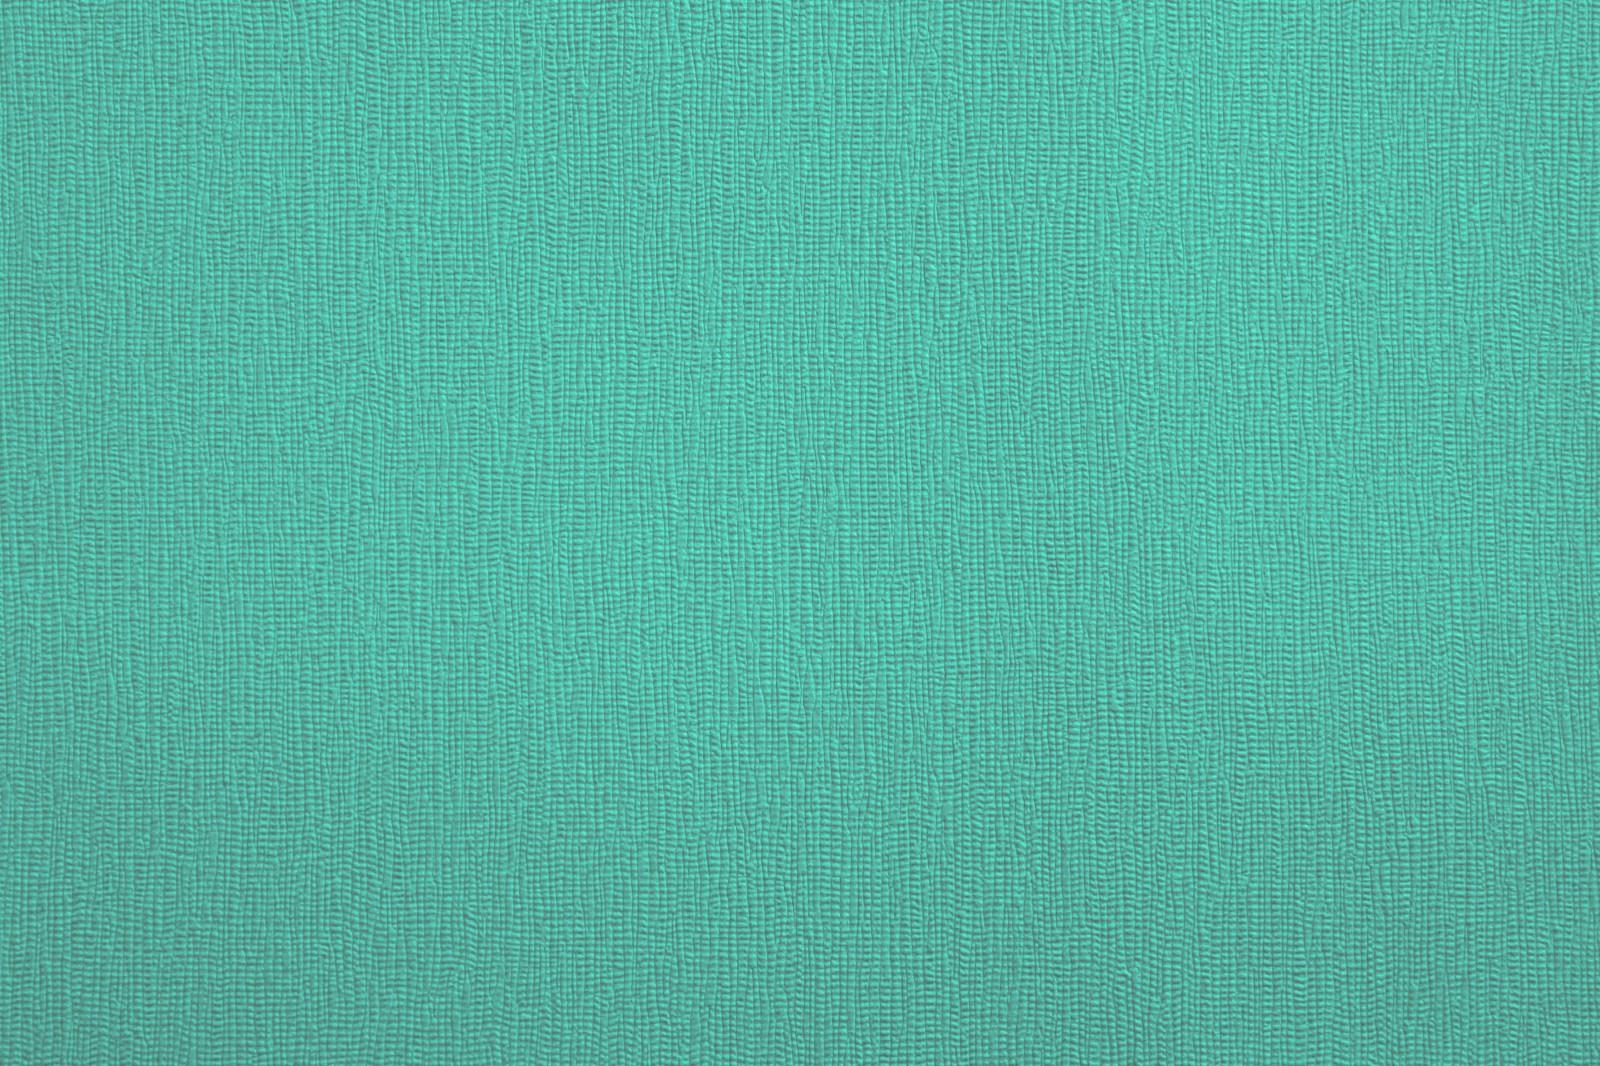 tapete rasch seduction vliestapete 796216 uni t rkis blau. Black Bedroom Furniture Sets. Home Design Ideas